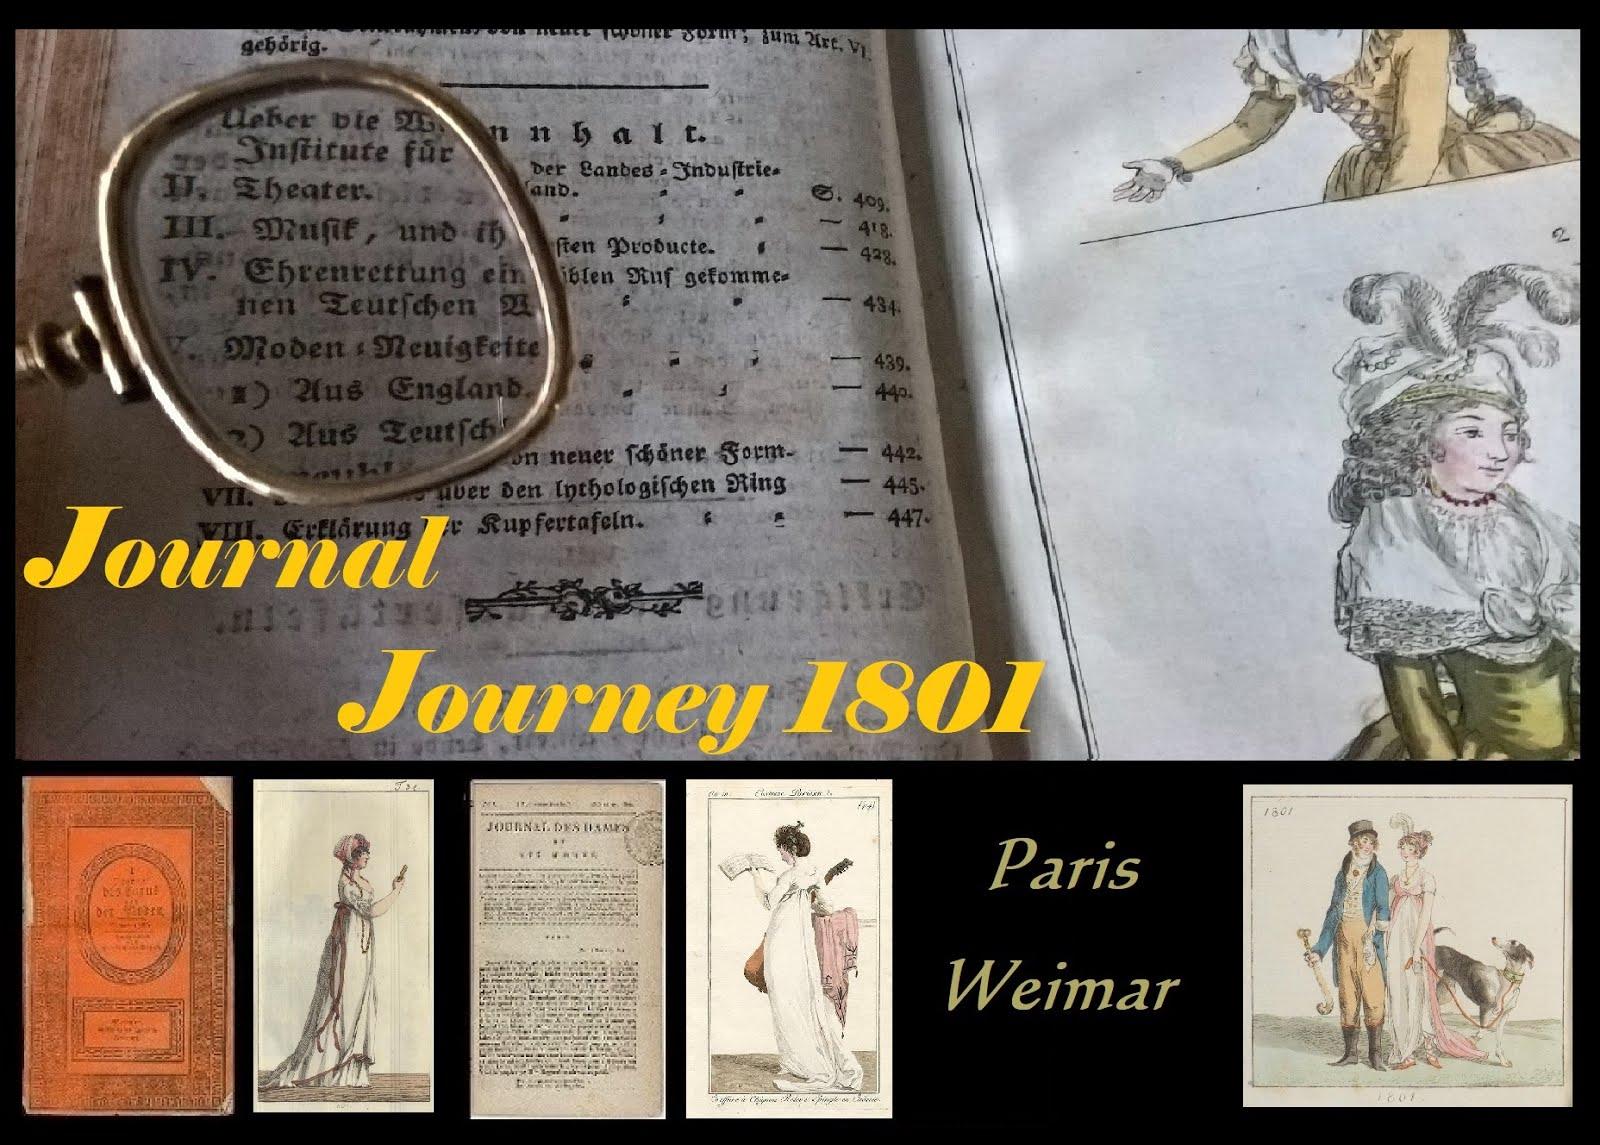 Journal Journey 1801